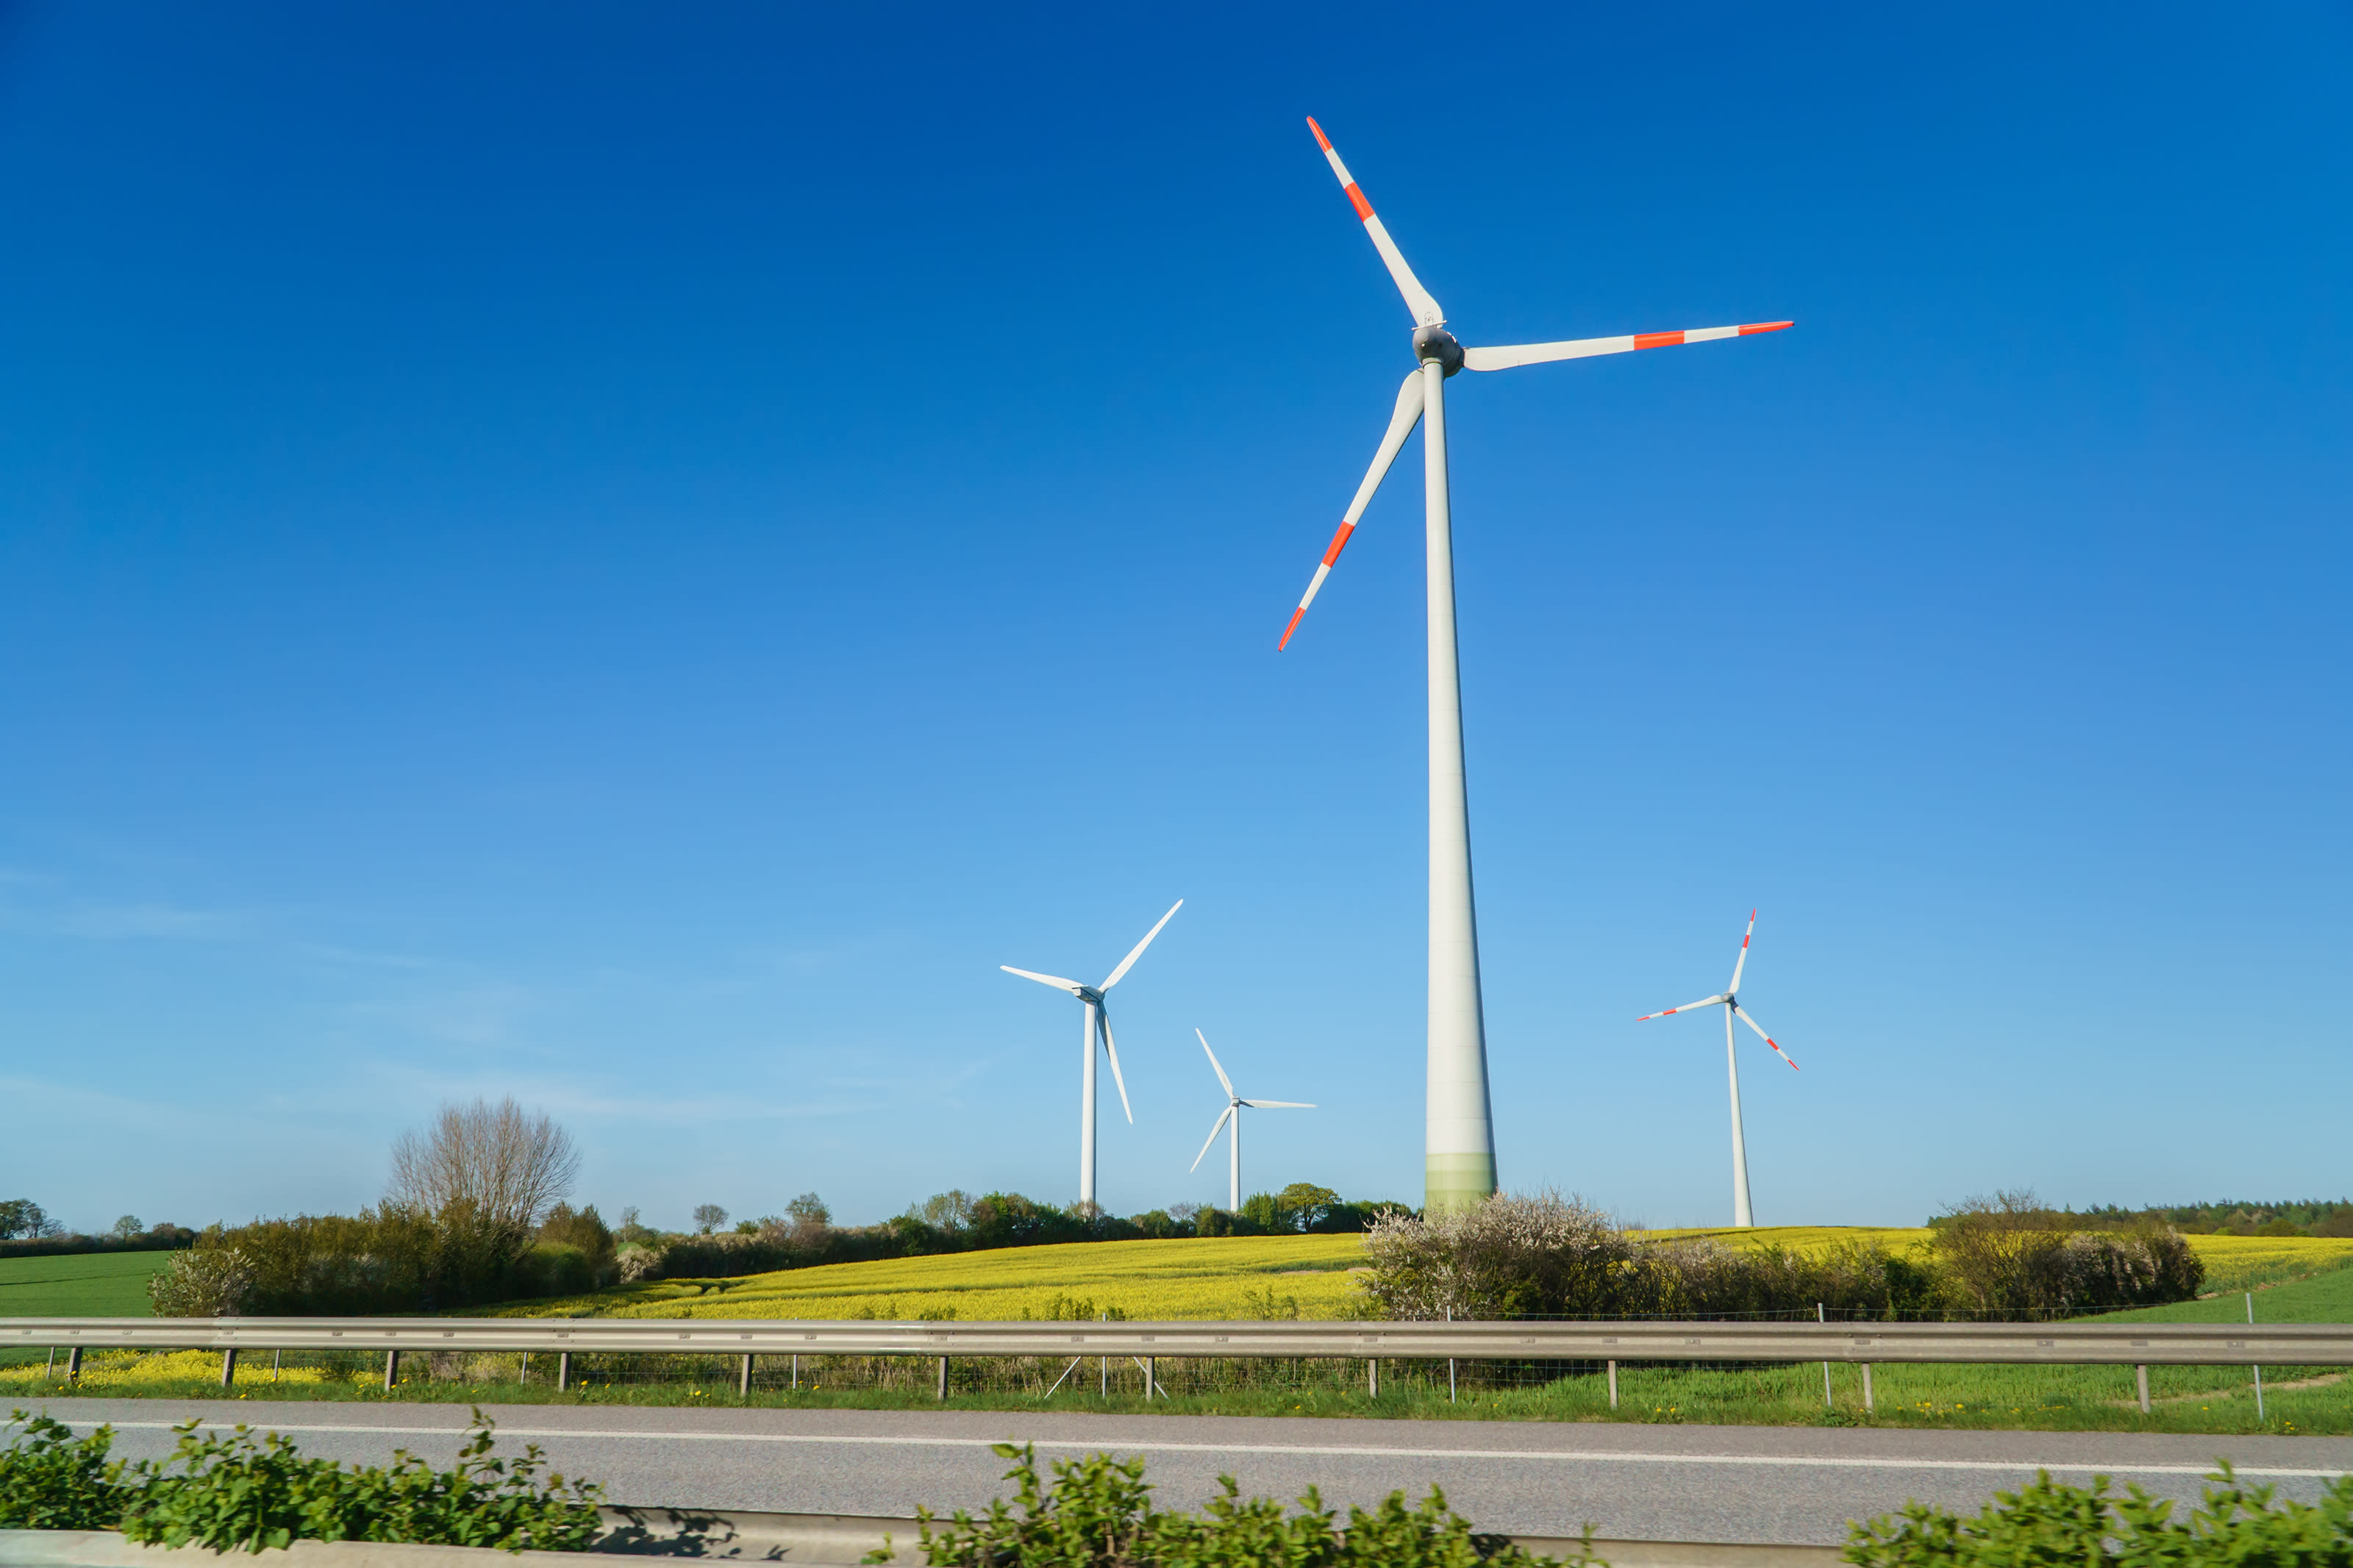 【Yahoo論壇/龔意琇】城市、企業、公民共同建構低碳城市 使地球降溫